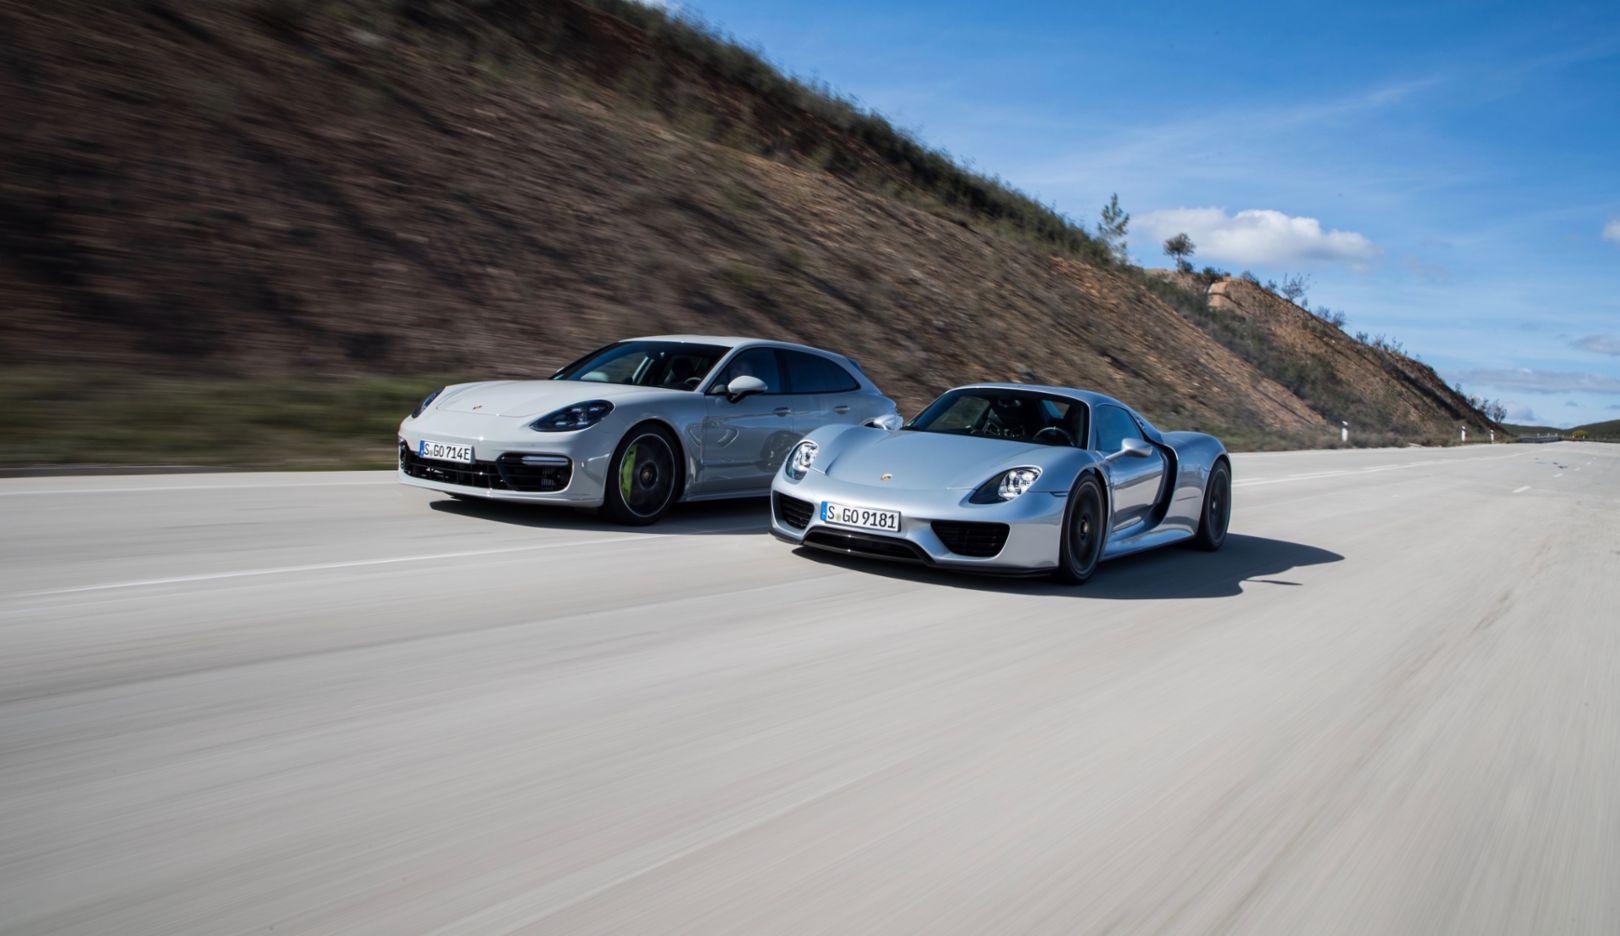 Panamera Turbo S E-Hybrid Sport Turismo, 918 Spyder, l-r, Portimao, 2018, Porsche AG